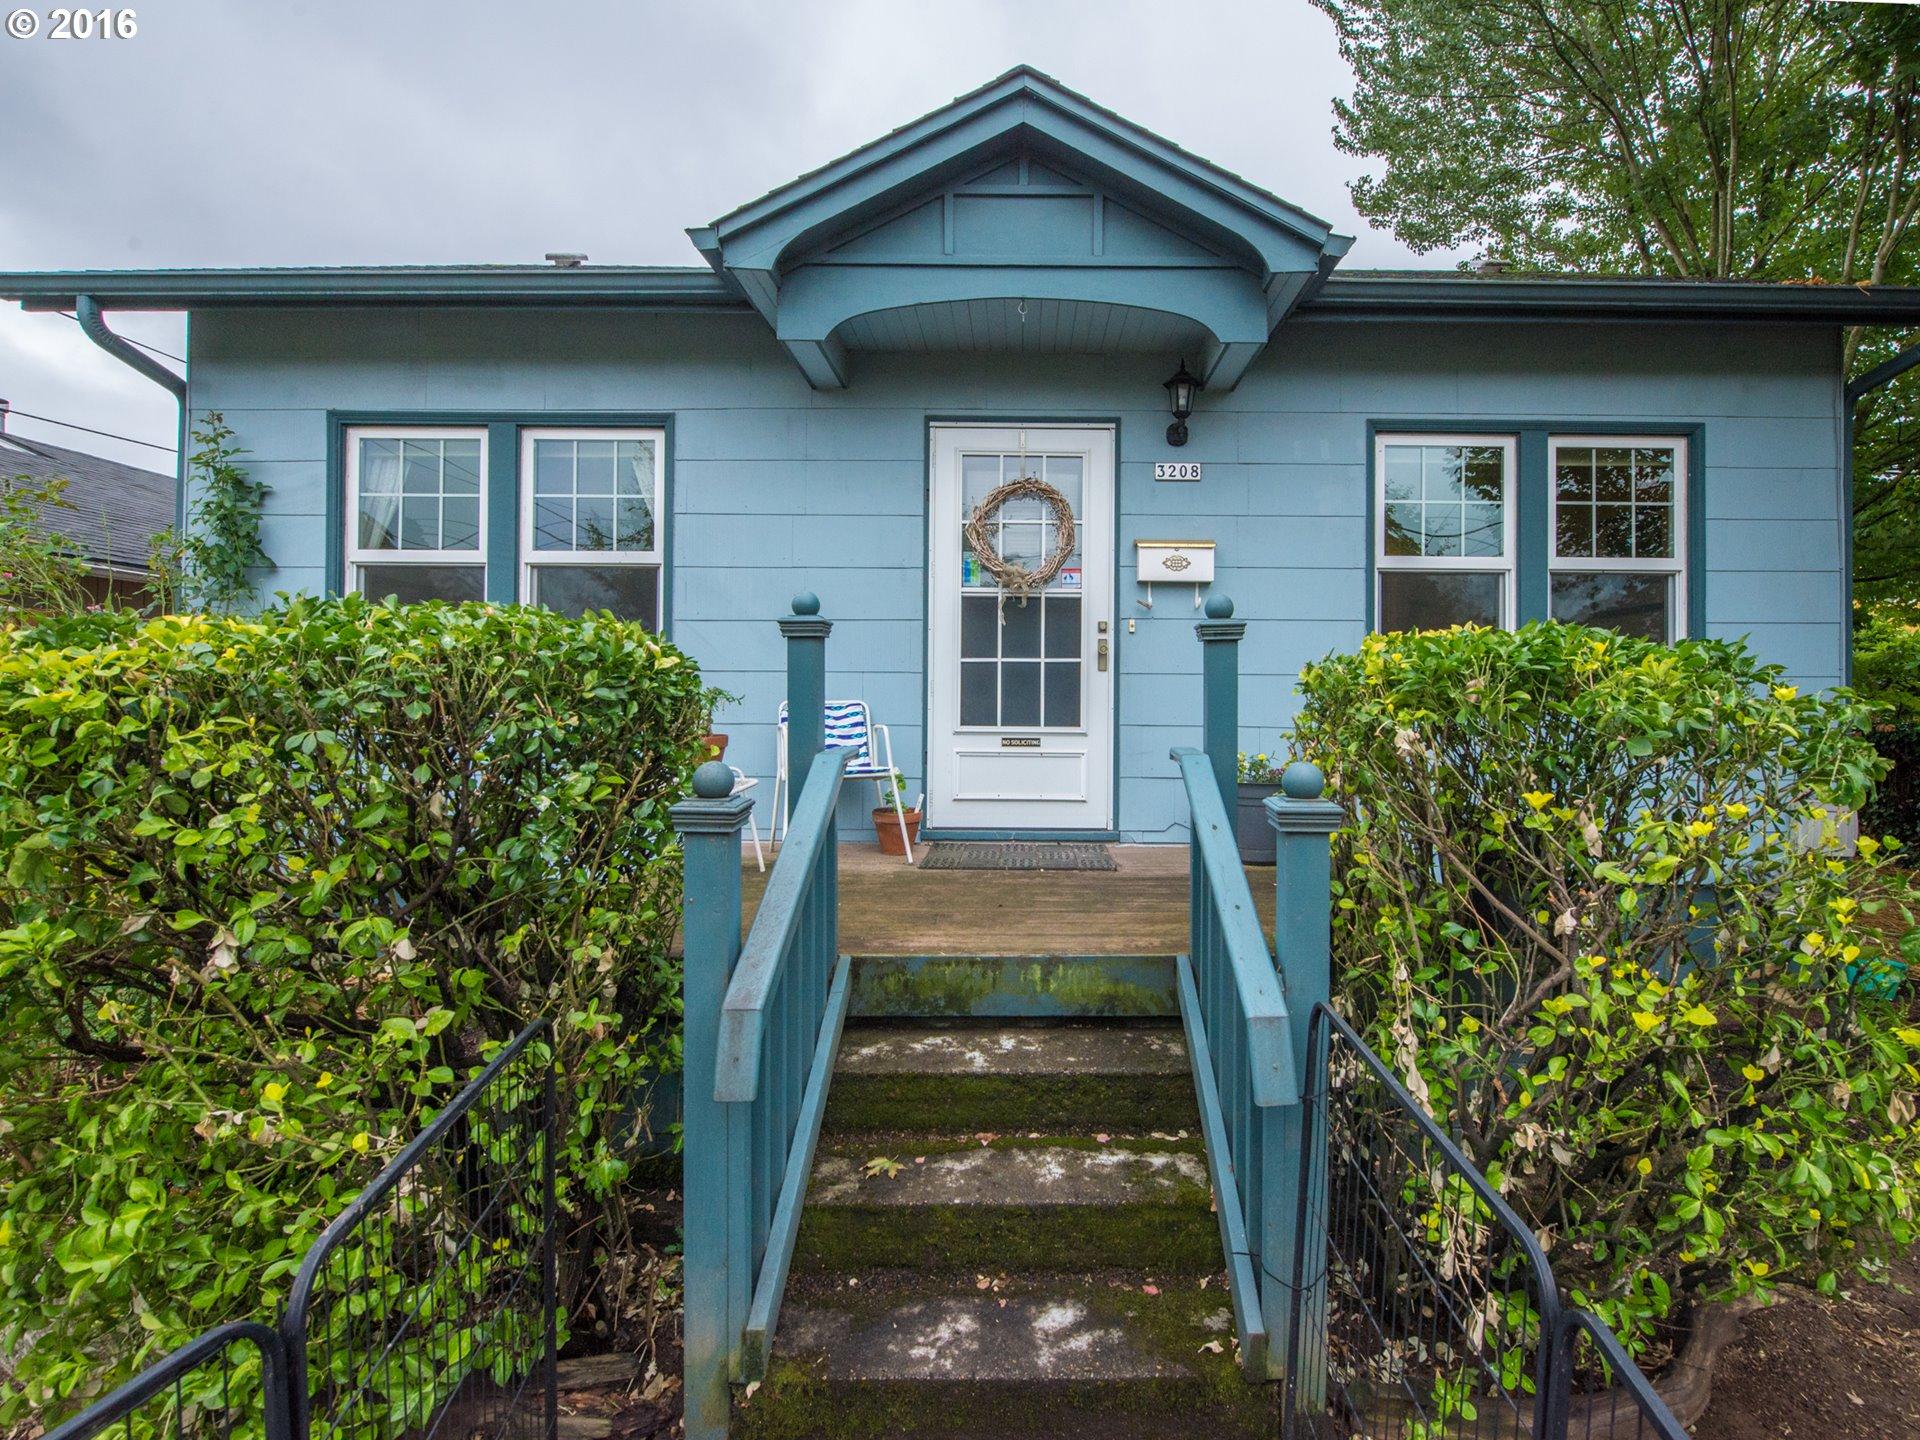 3208 N WILLIS BLVD, Portland, OR 97217